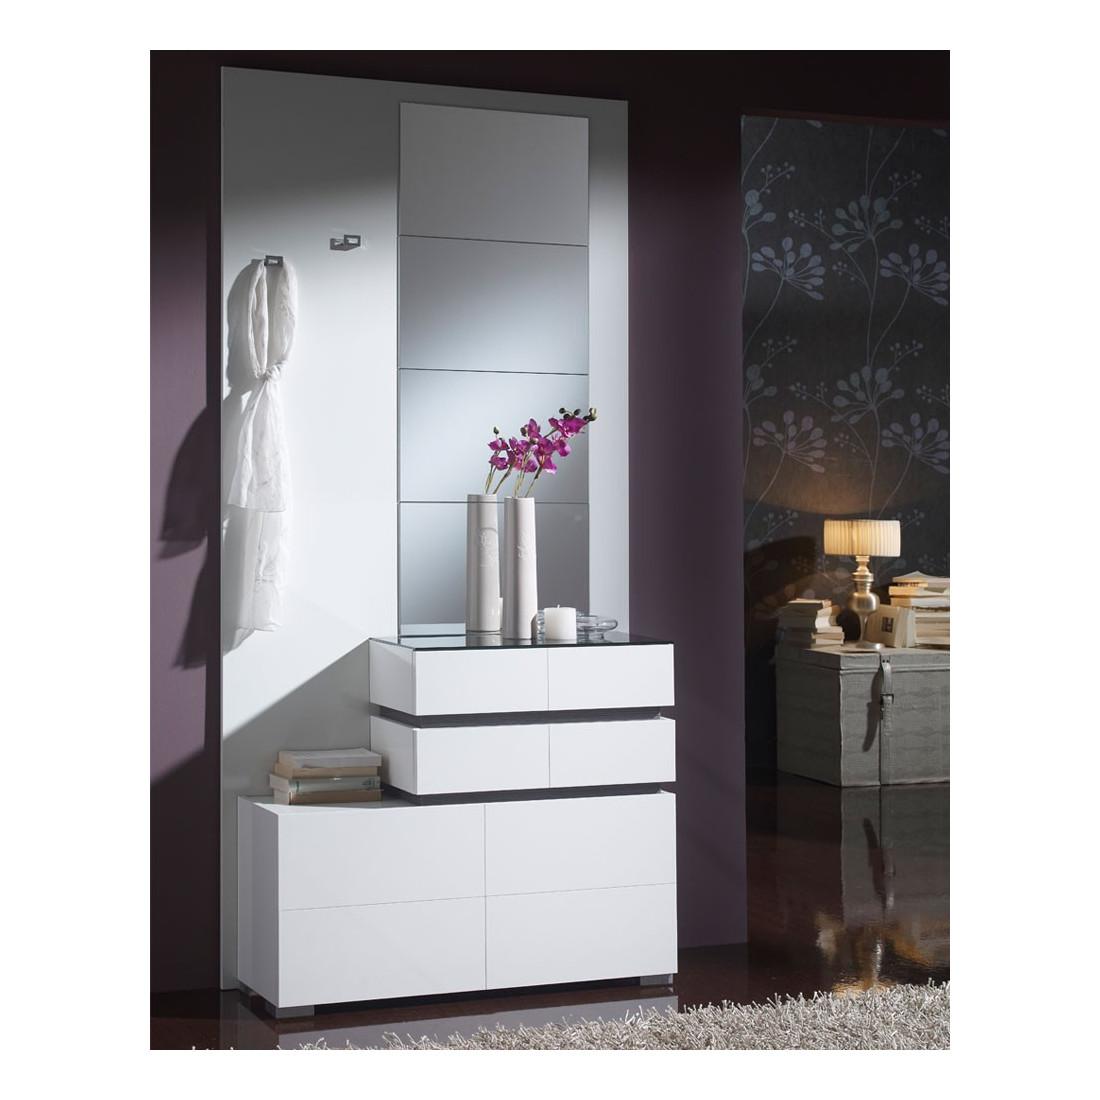 meuble d 39 entr e blanc miroirs vana univers petits meubles mesmeubles. Black Bedroom Furniture Sets. Home Design Ideas